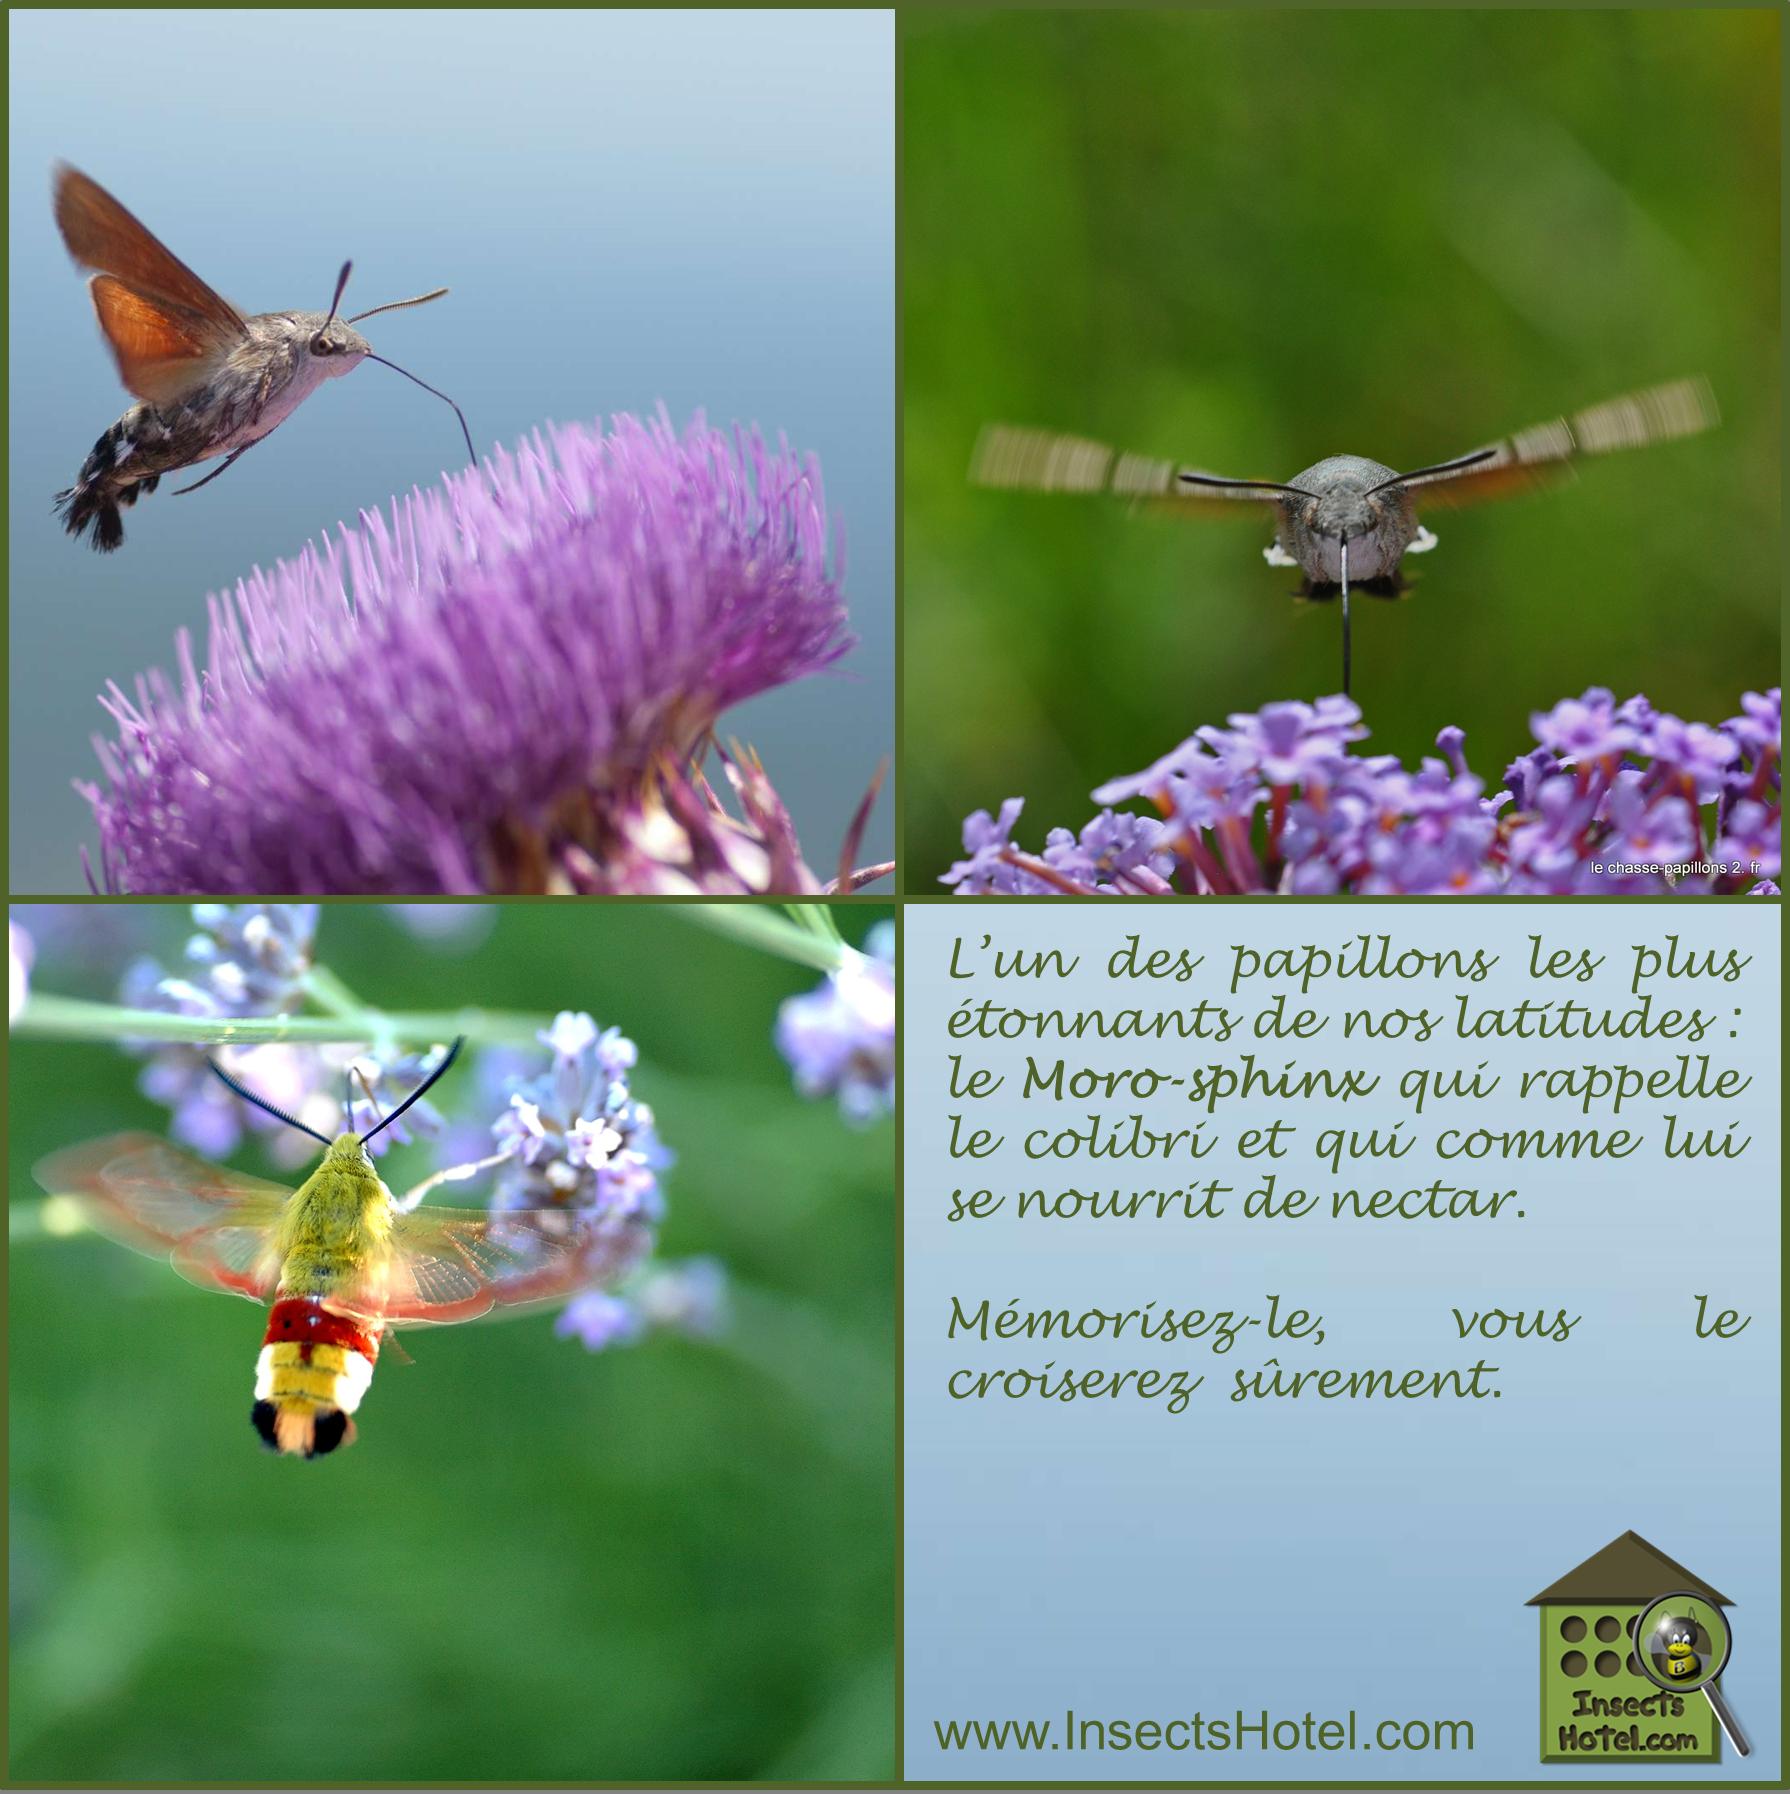 Le Moro-sphinx #insectes #InsectHotel #insecte #nature #biologie #animal #animaux #biodiversité #biodiversity #faune #wildlife